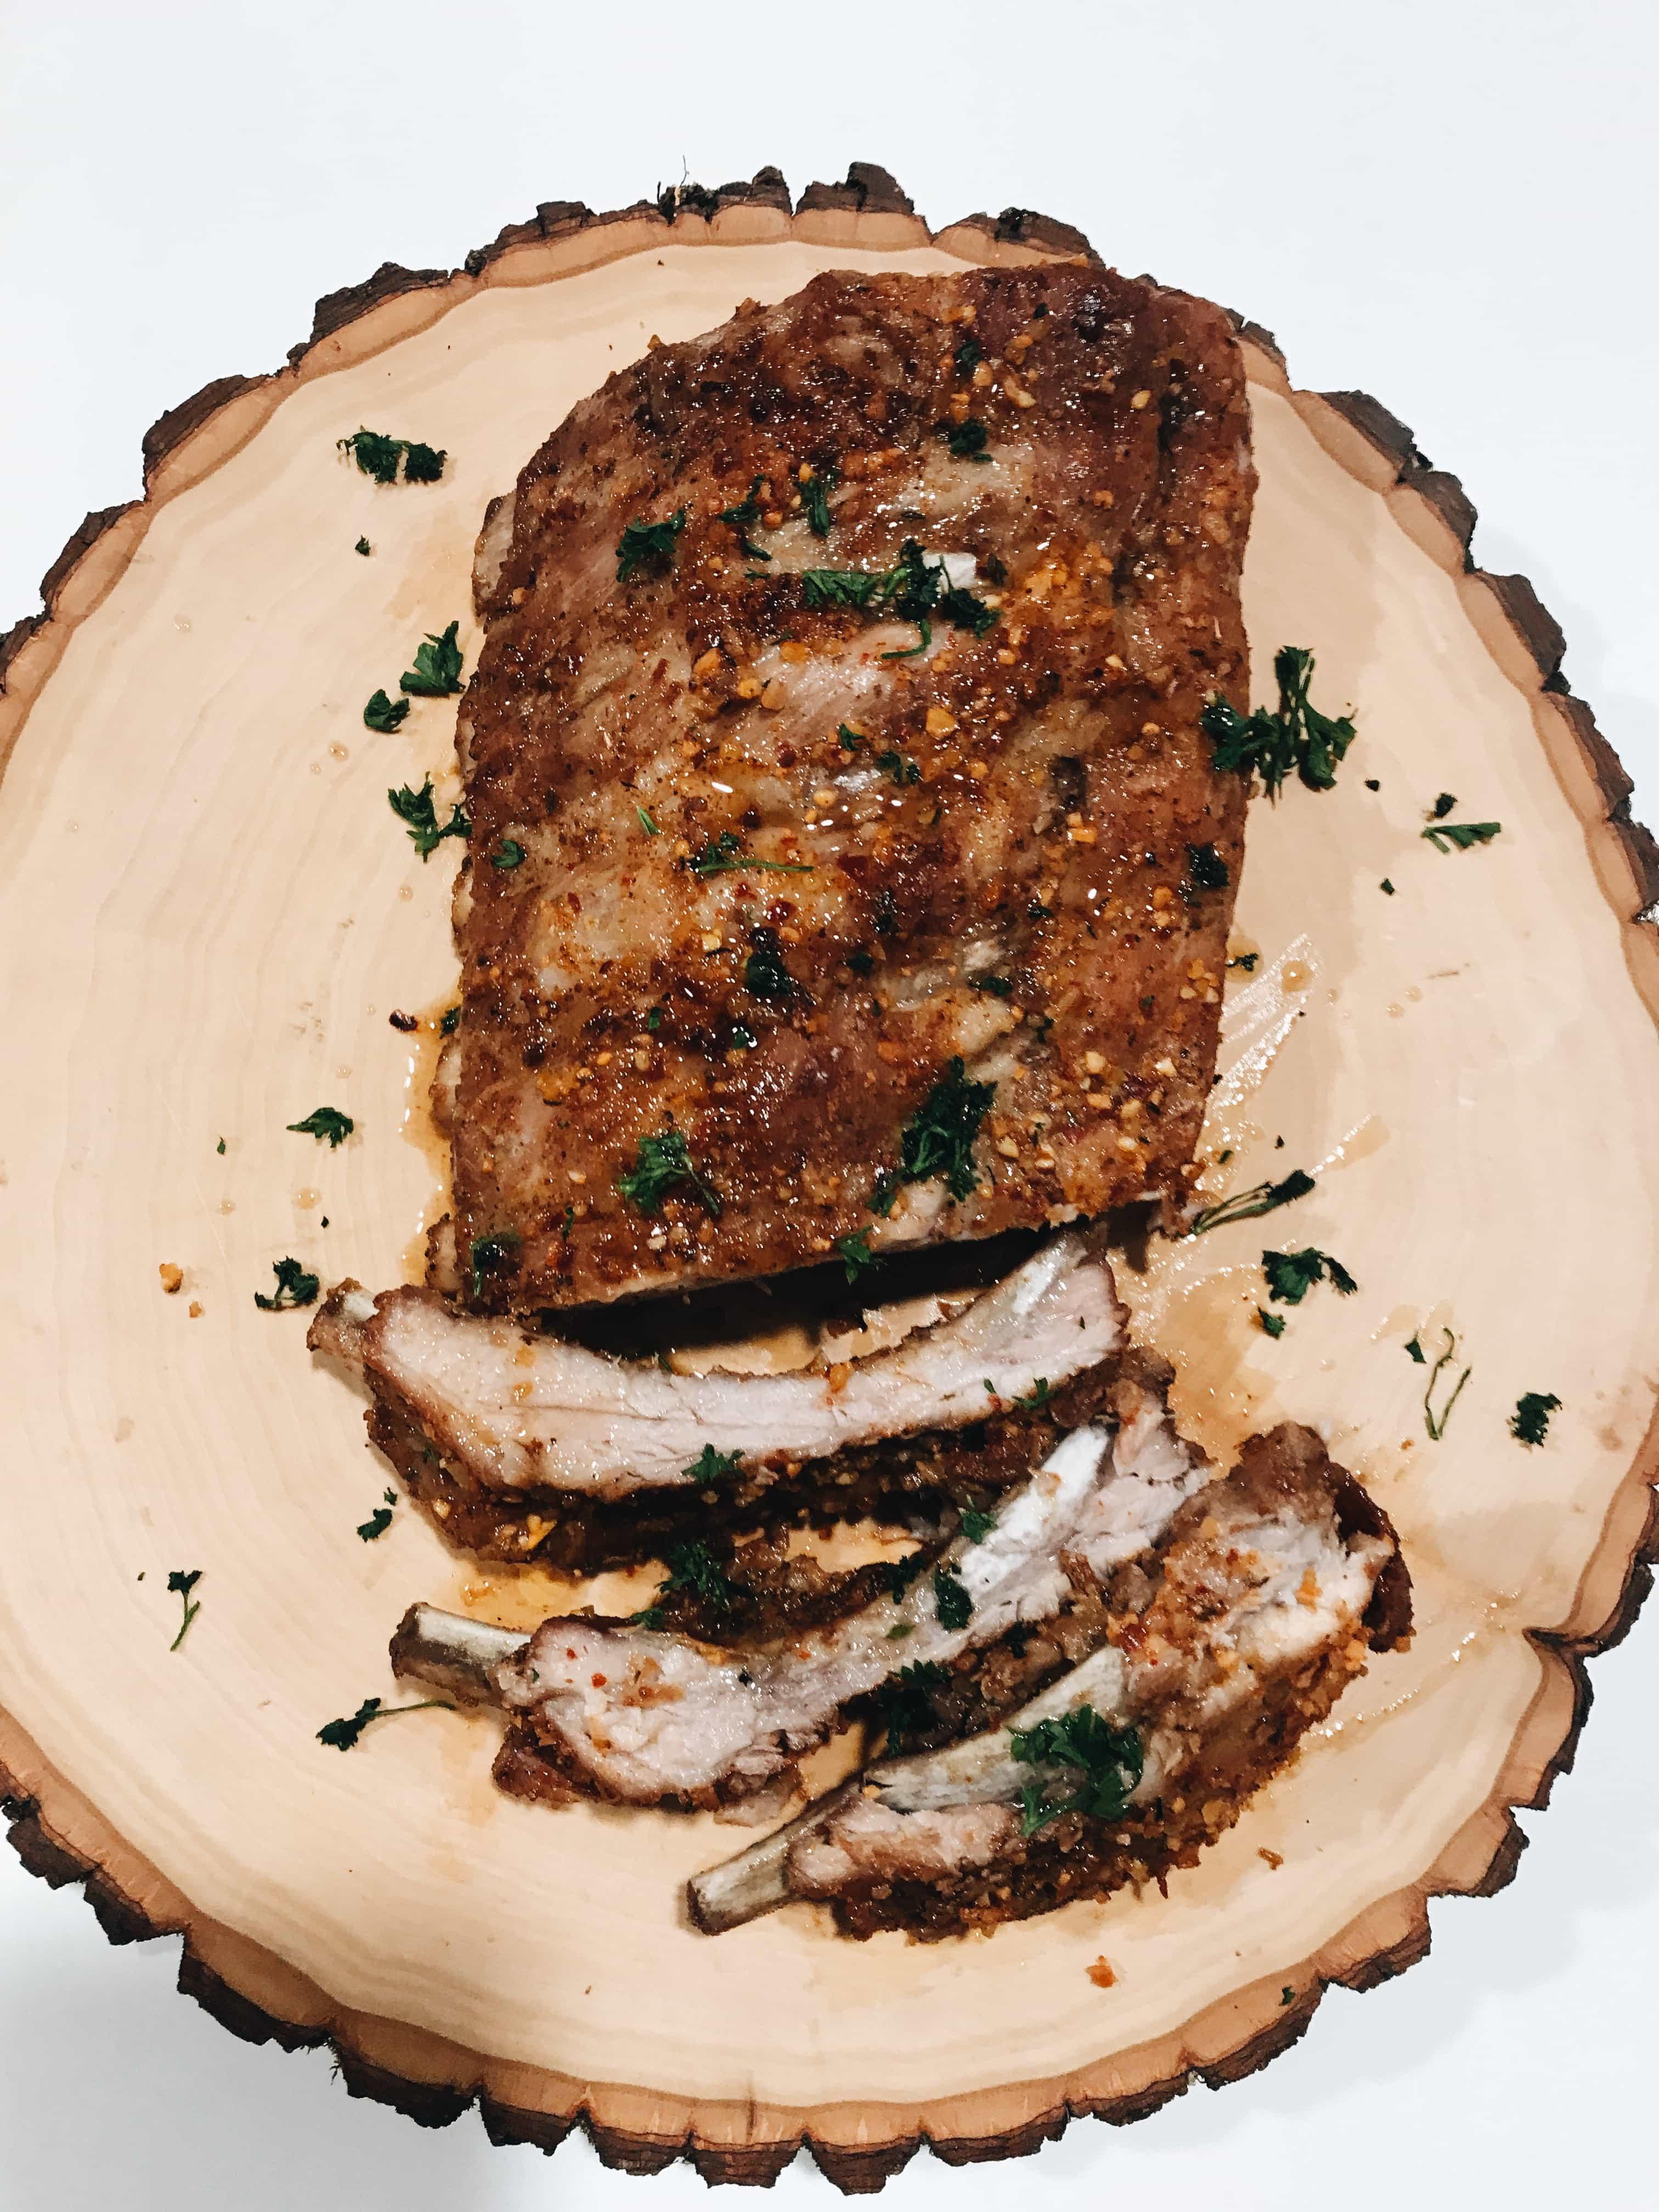 Chipotle BBQ Ribs